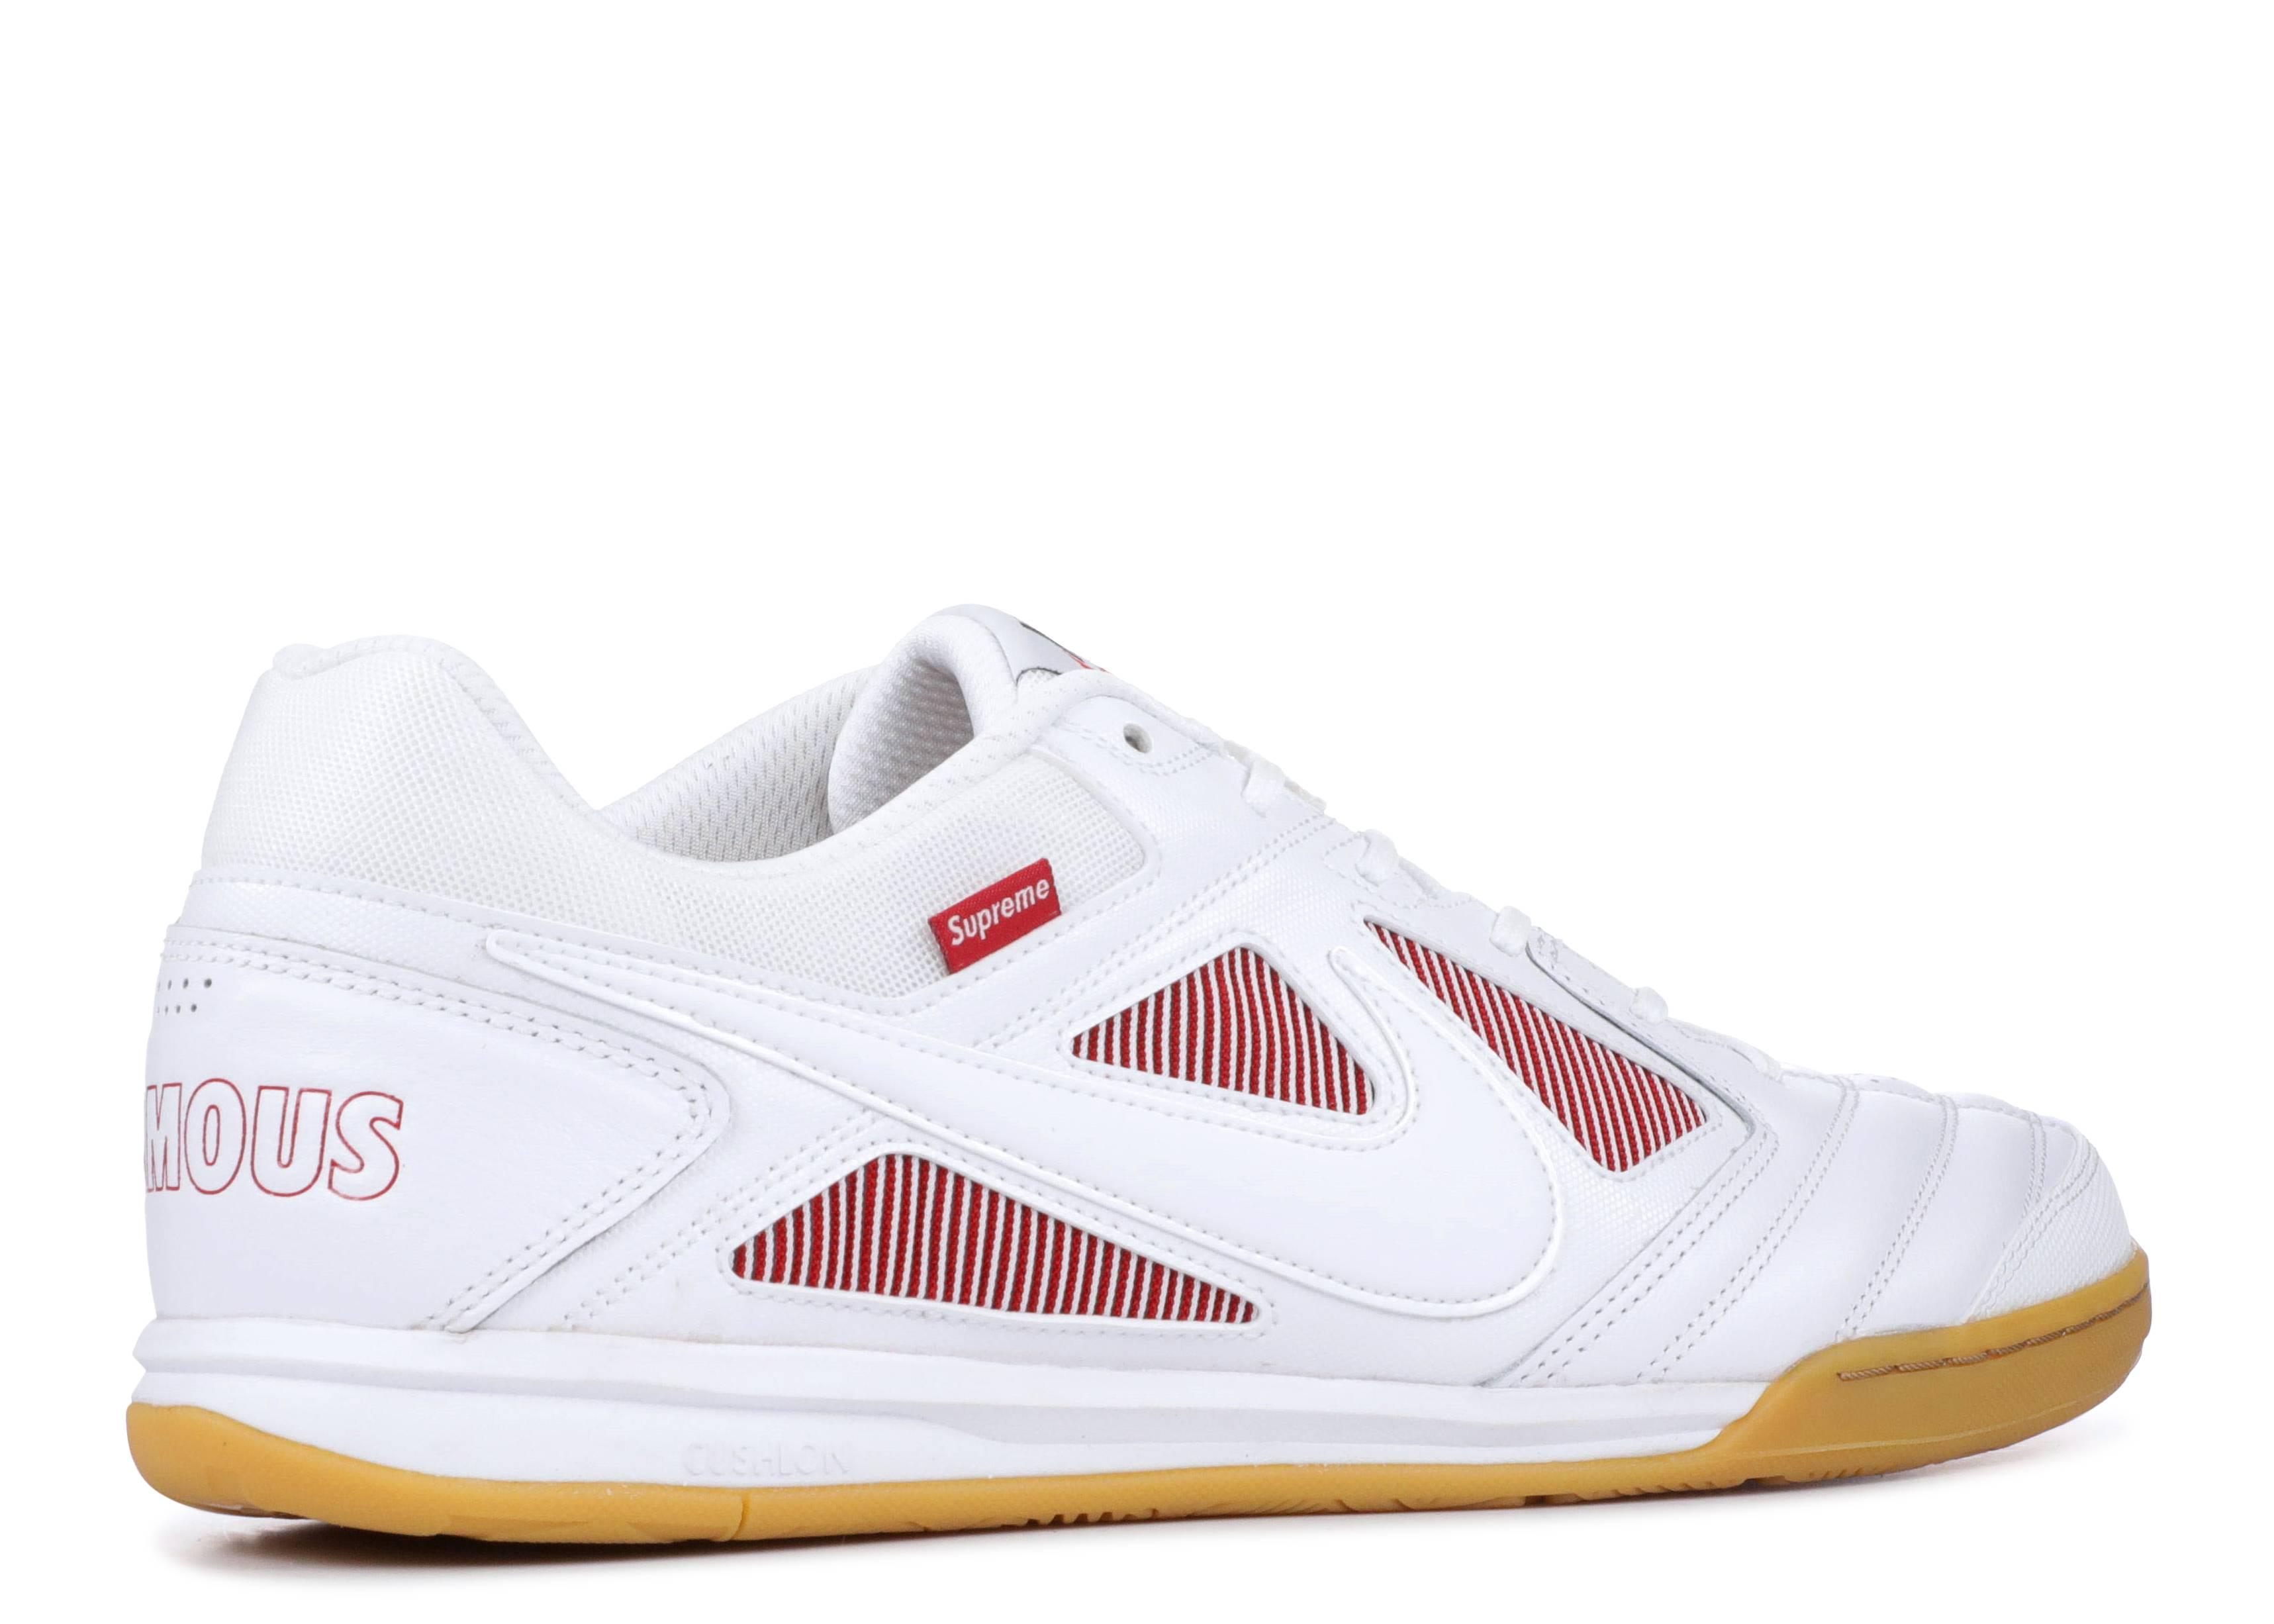 3abcc930ddf Nike Sb Gato Qs